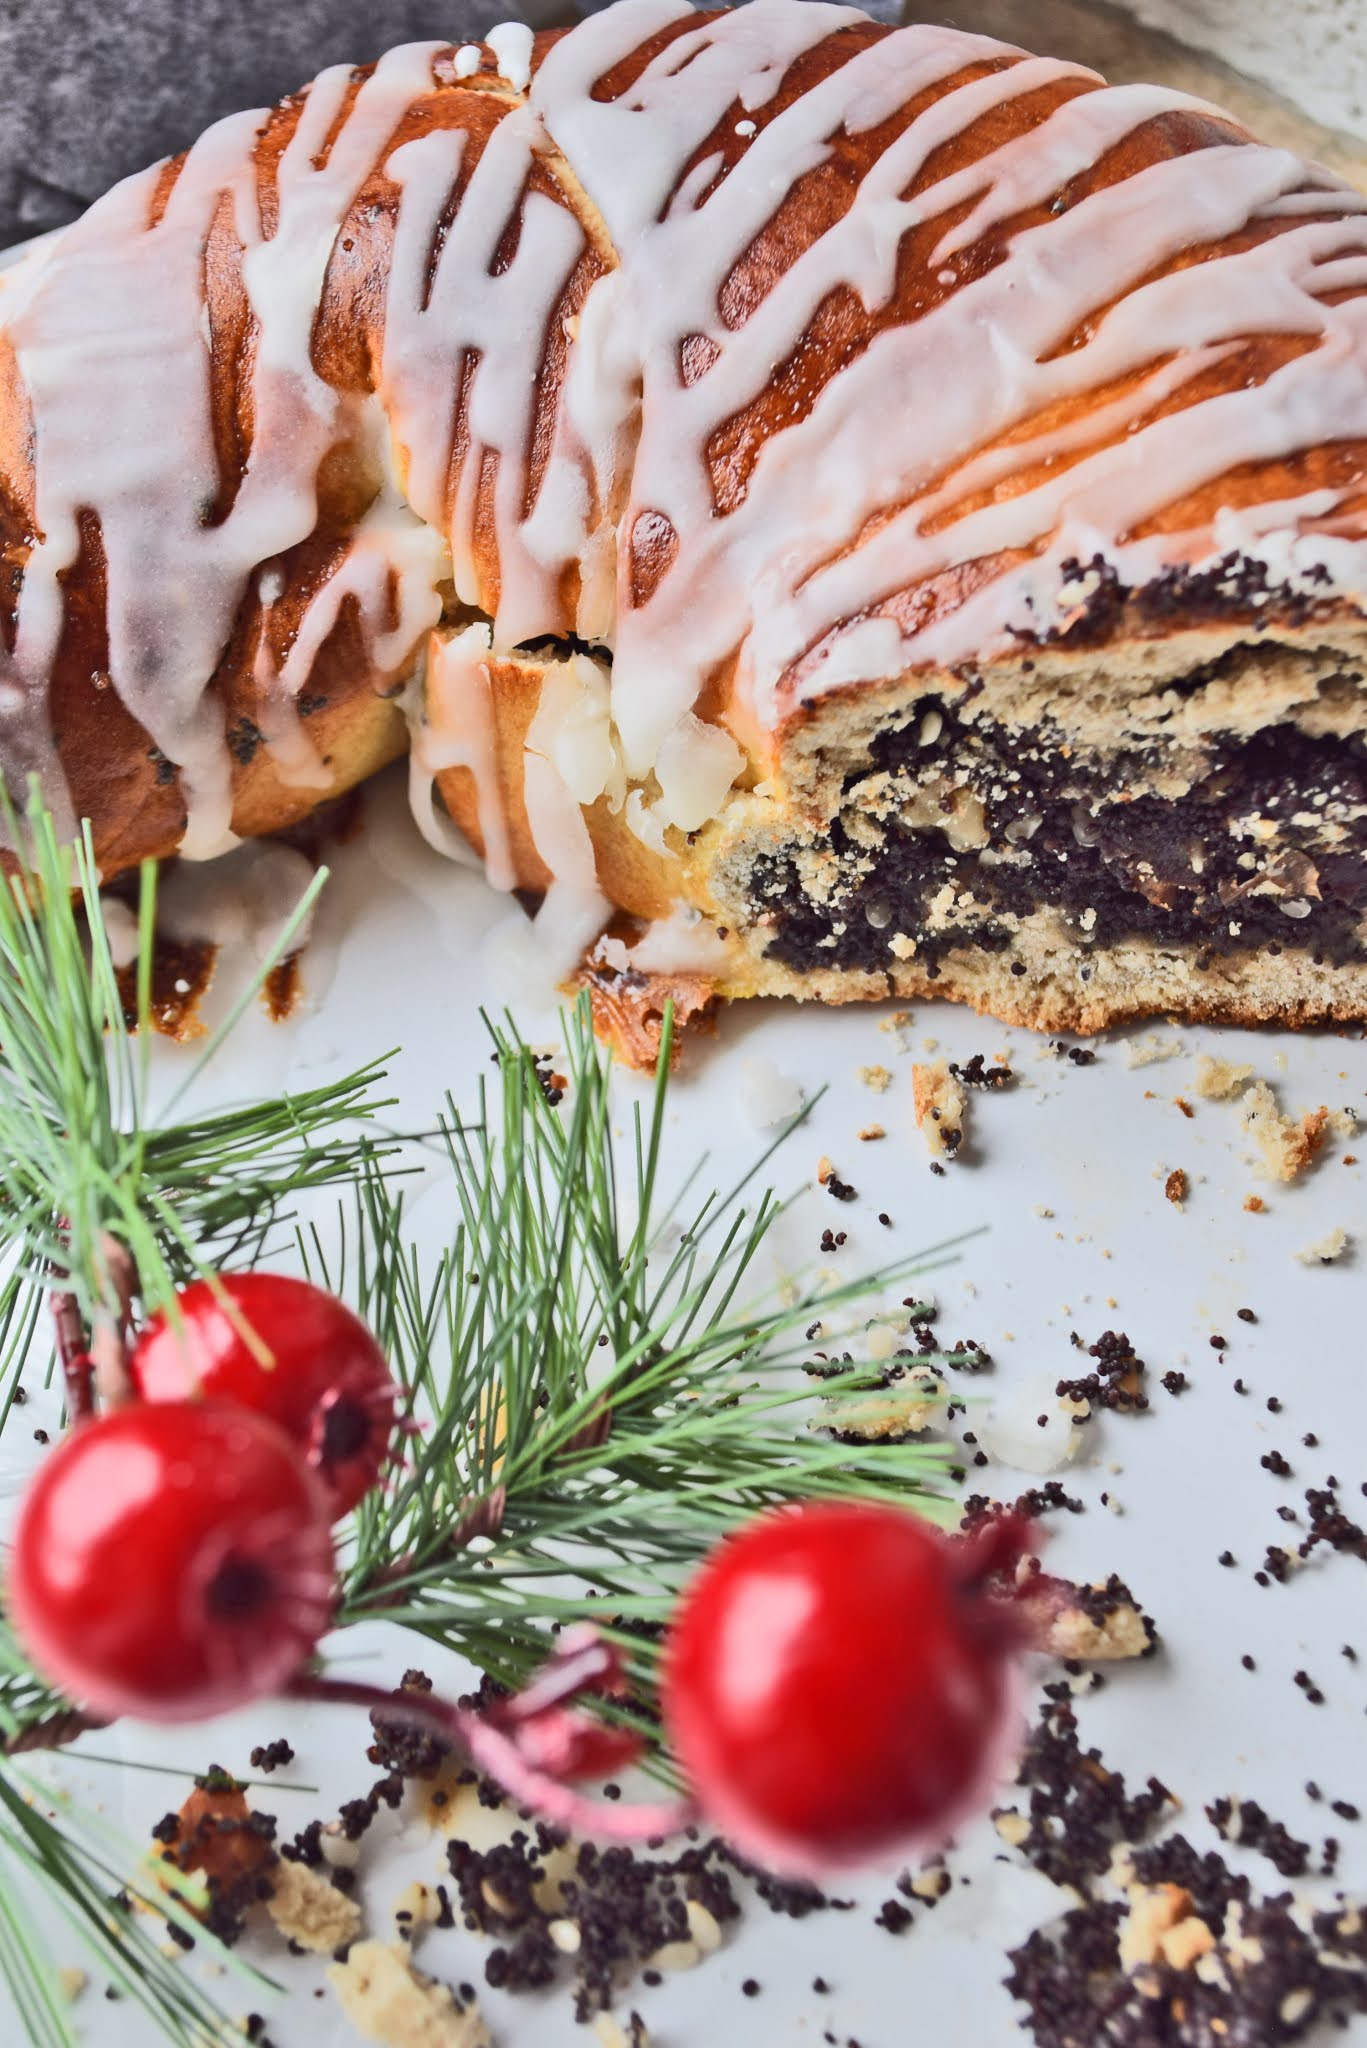 Bożonarodzeniowe ciasta